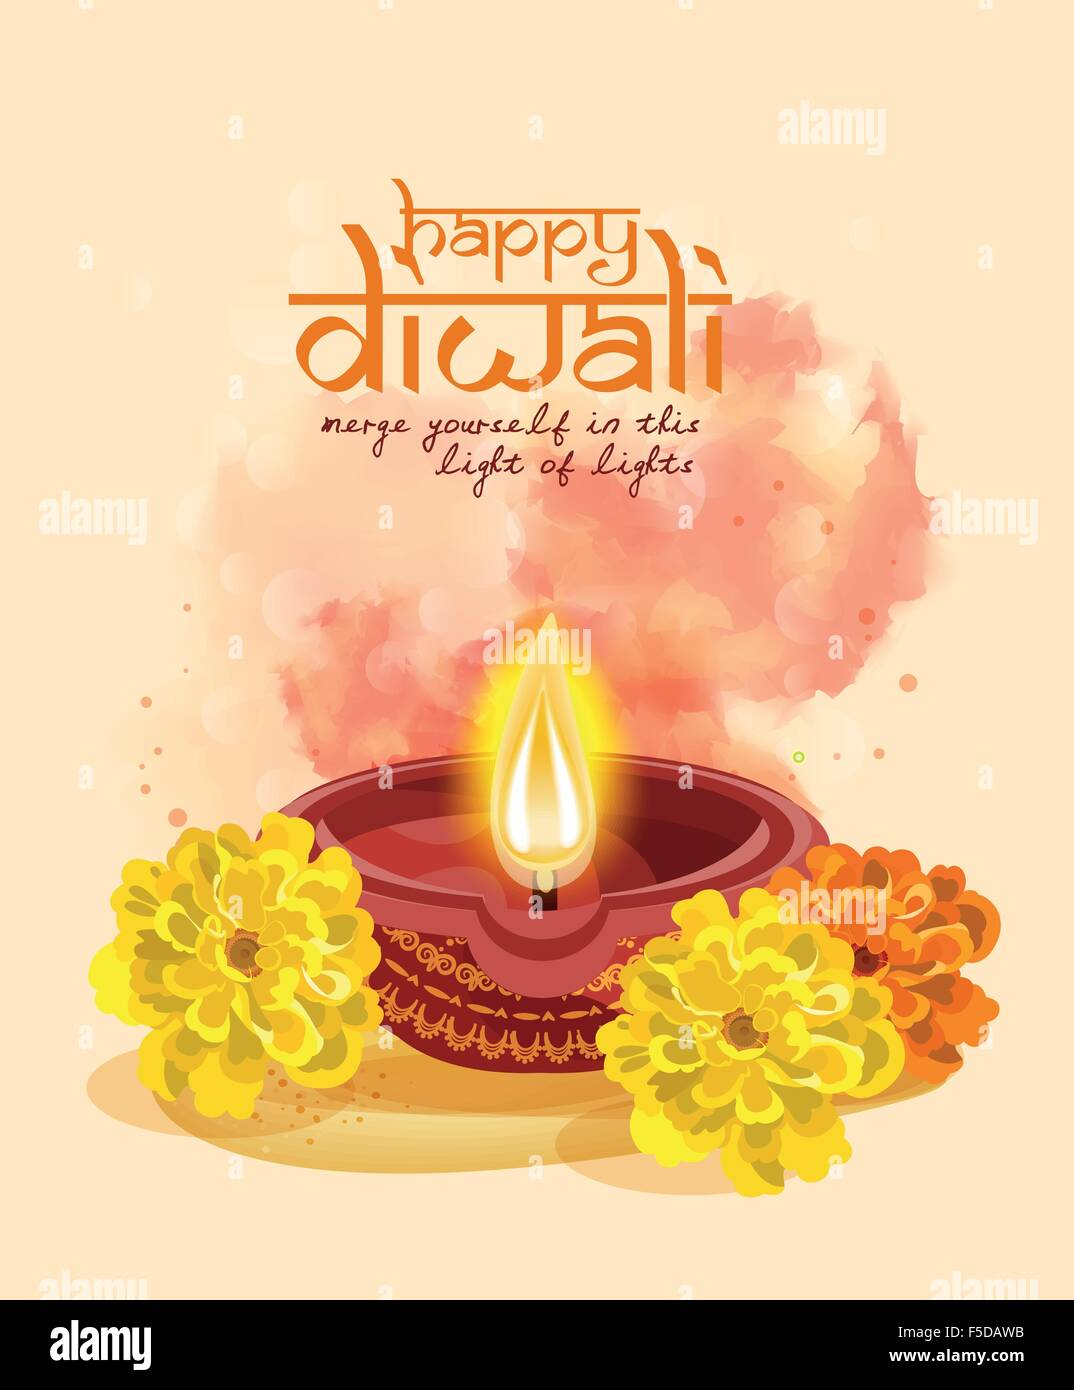 Vector Greeting Card For Hindu Community Festival Diwali Stock